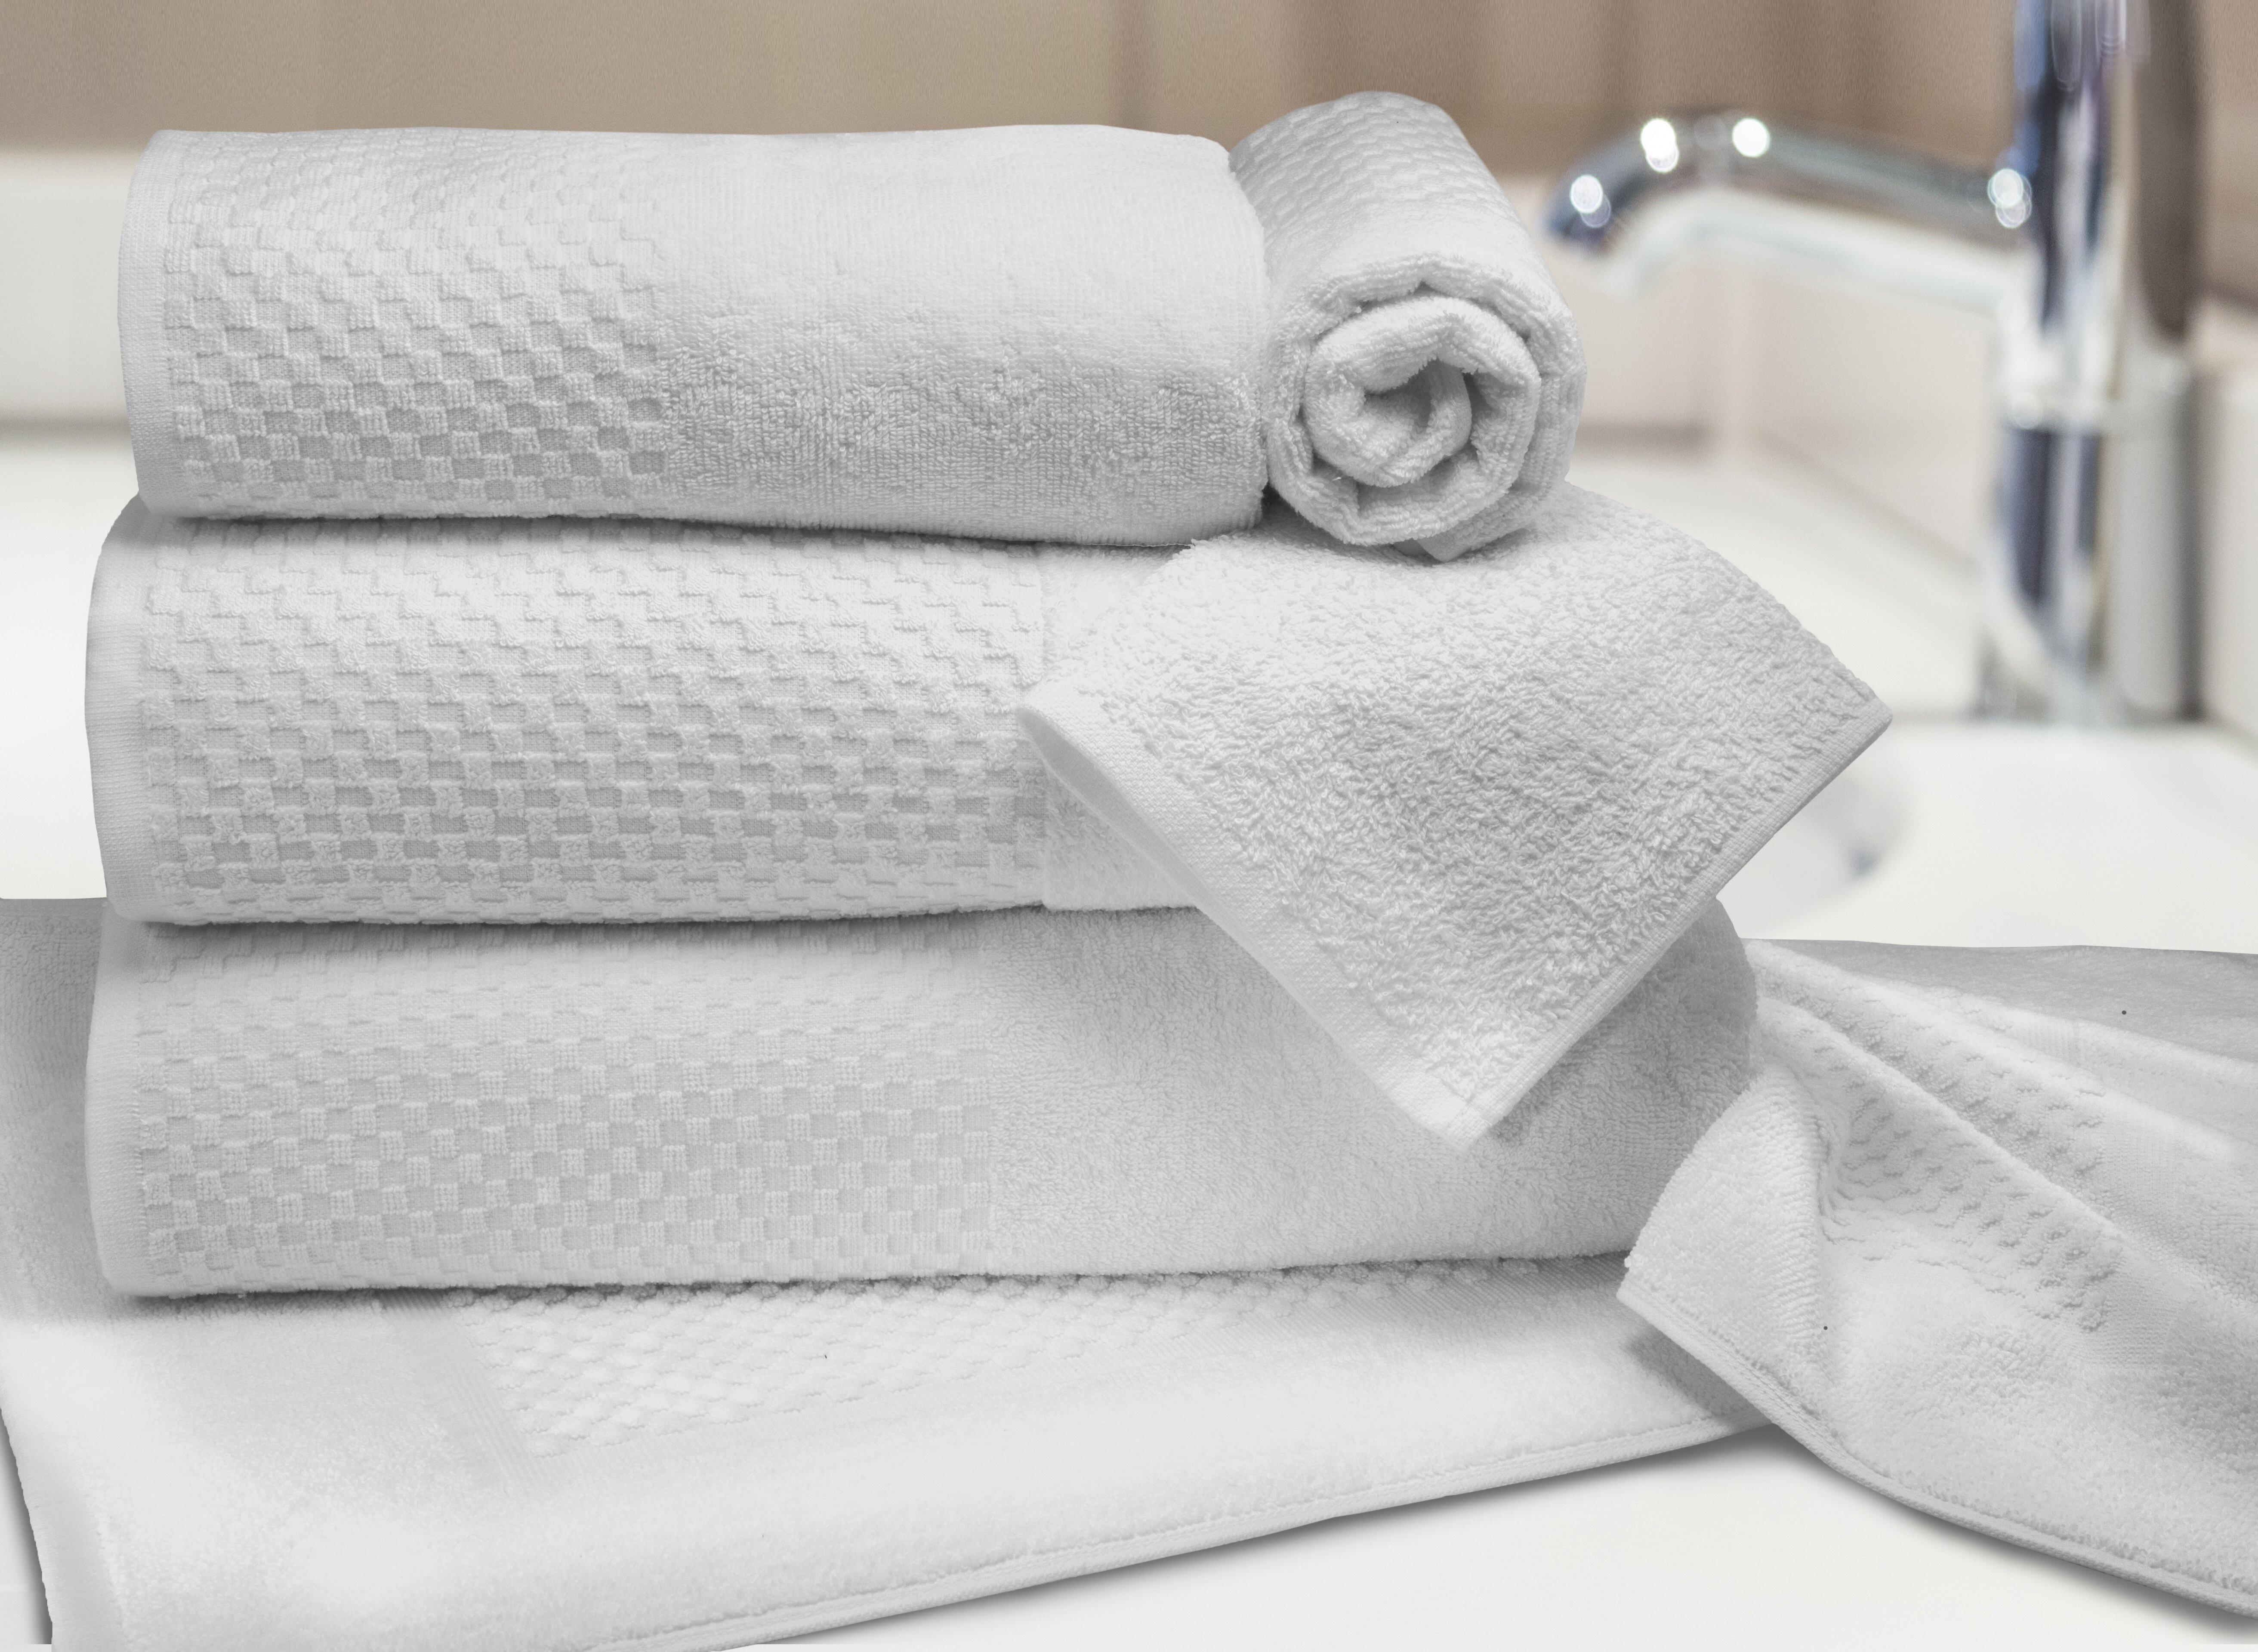 Destination Home By Hilton Hilton Worldwide Revolution 100 Cotton Bath Towel Reviews Wayfair